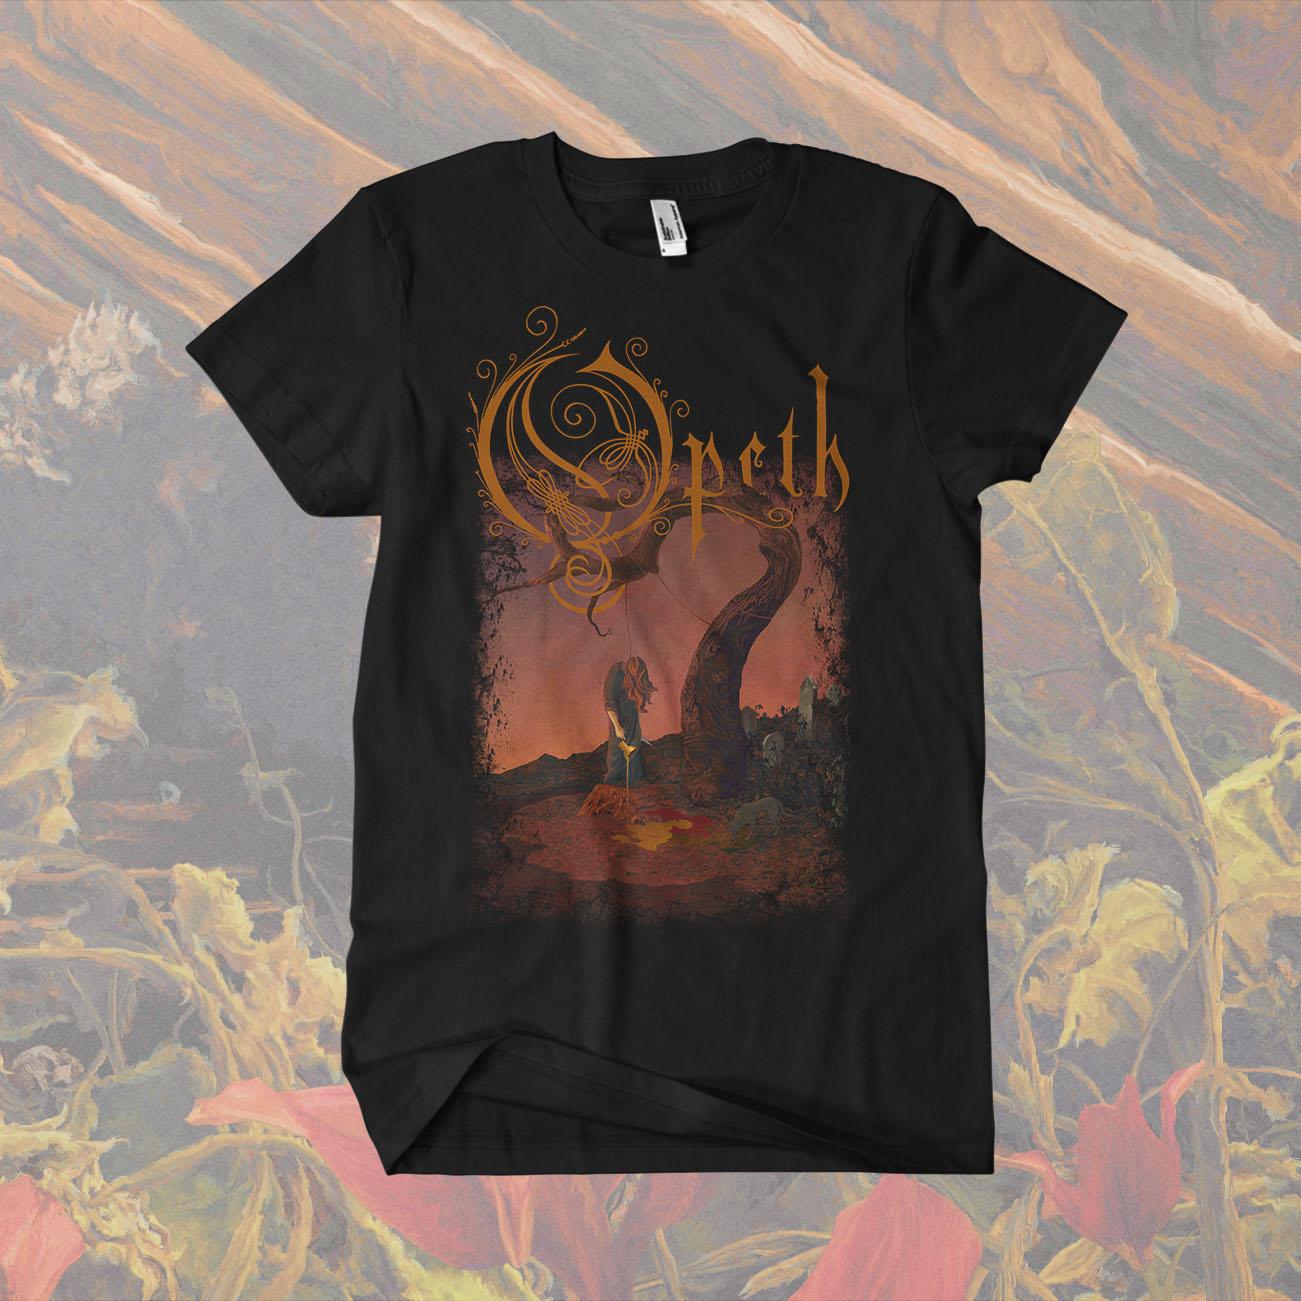 Opeth - 'Hanging' T-Shirt - Opeth